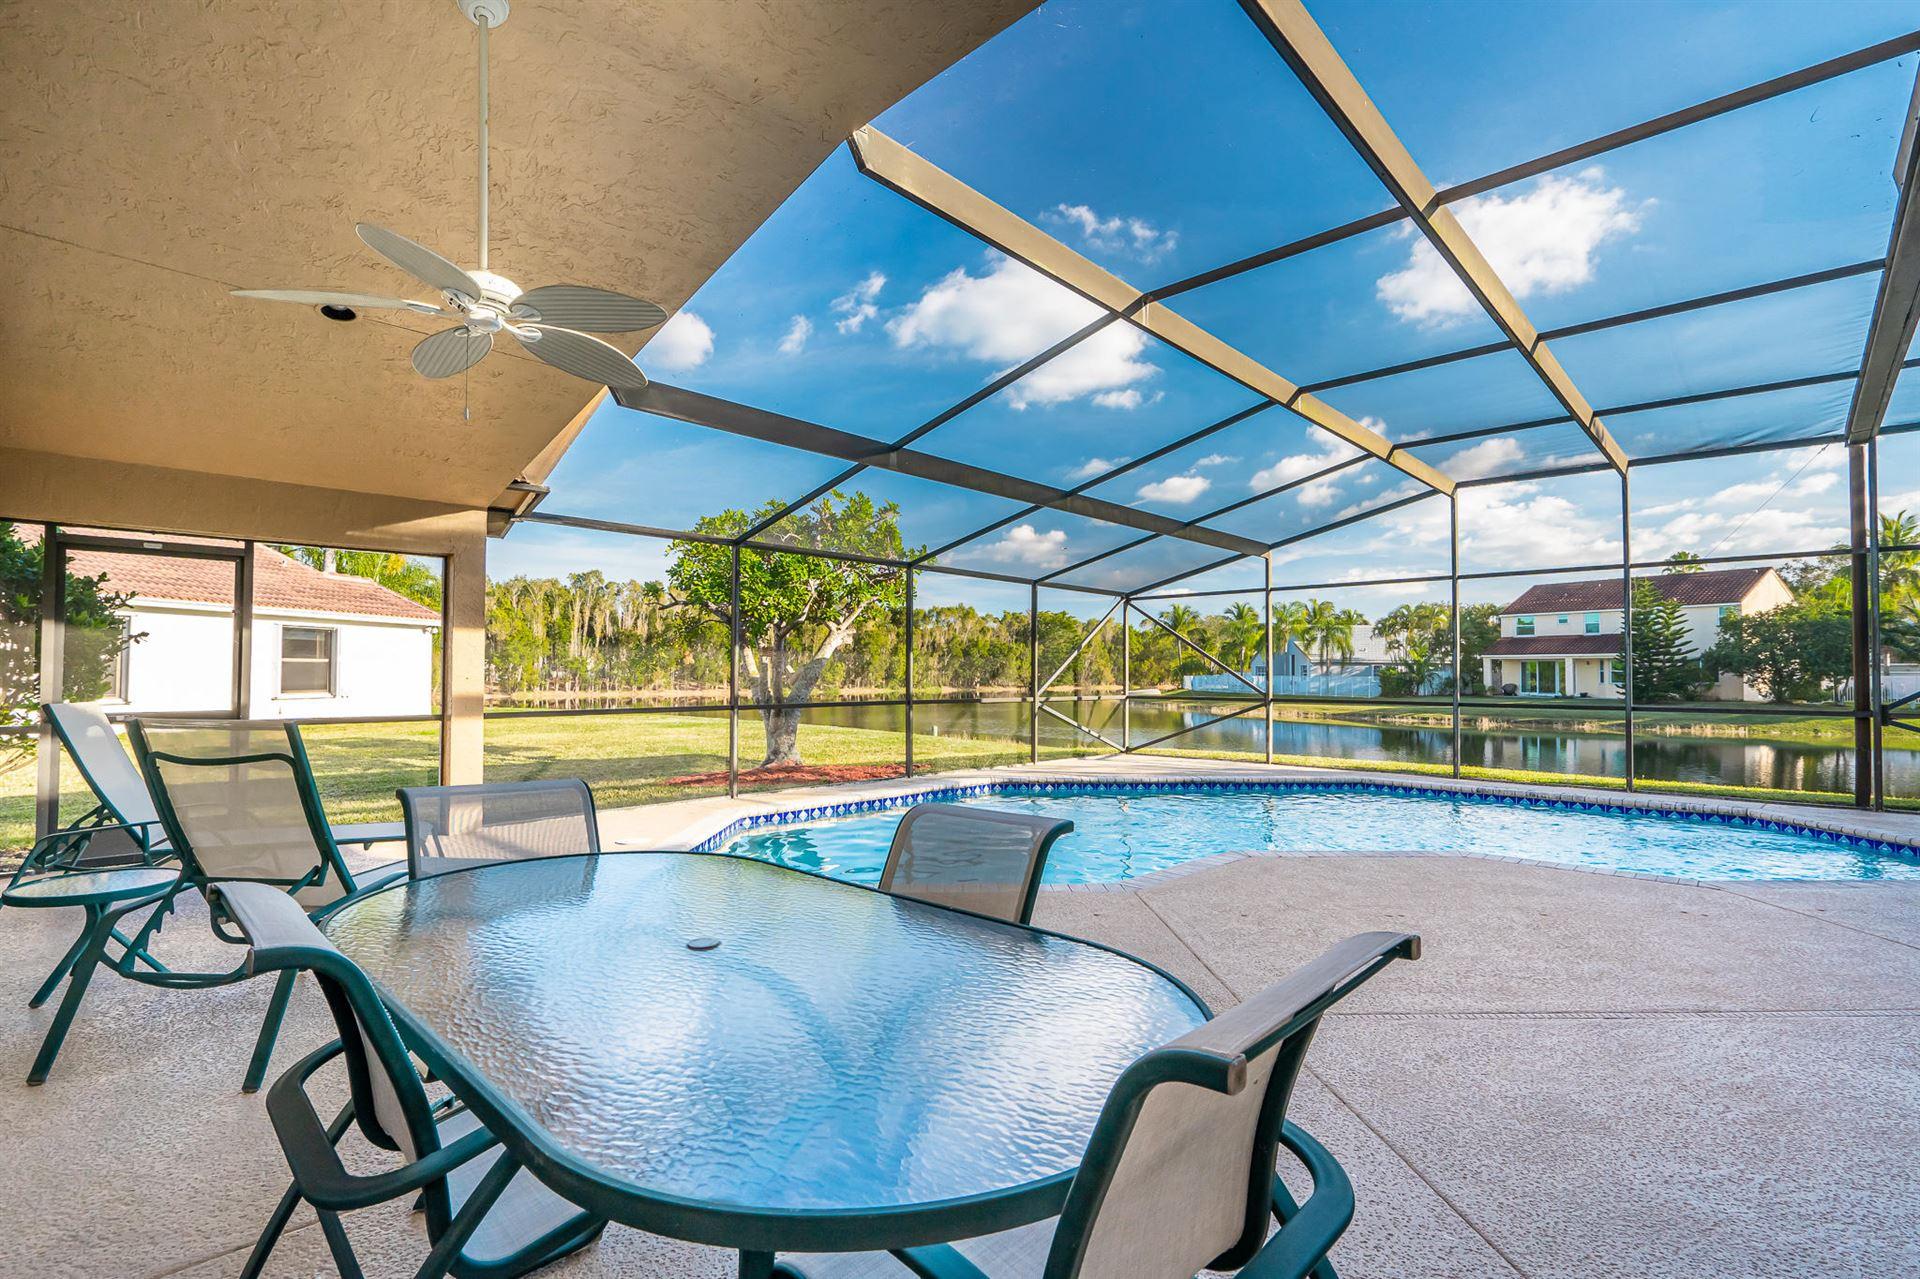 Photo of 466 Stonemont Drive, Weston, FL 33326 (MLS # RX-10687935)